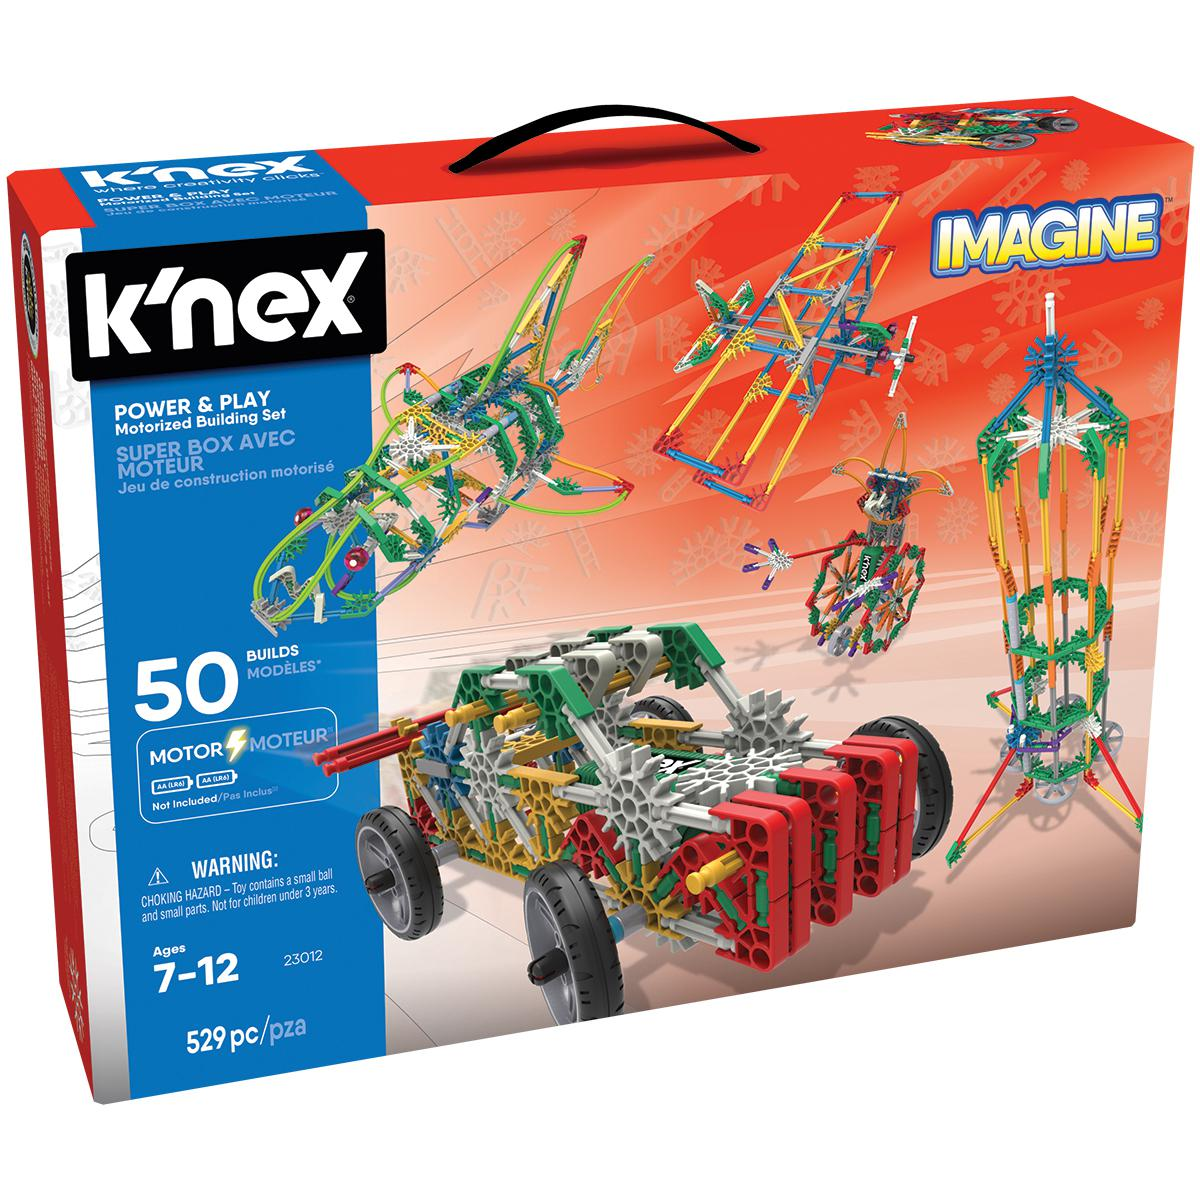 K'Nex® Power & Play 50 Model Motorized Building Set